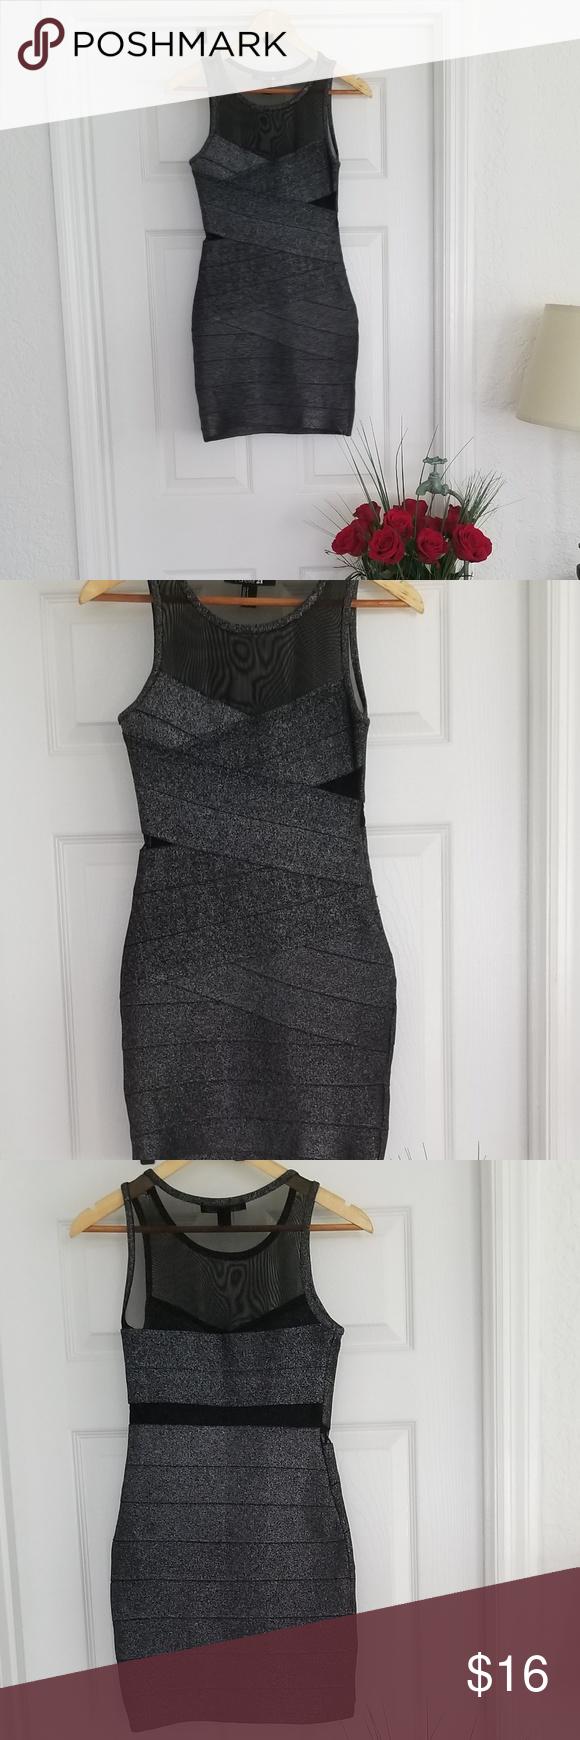 Black Silver Sparkle Dress Ll Forever21 Sparkle Dress Dresses Sequin Mini Dress [ 1740 x 580 Pixel ]